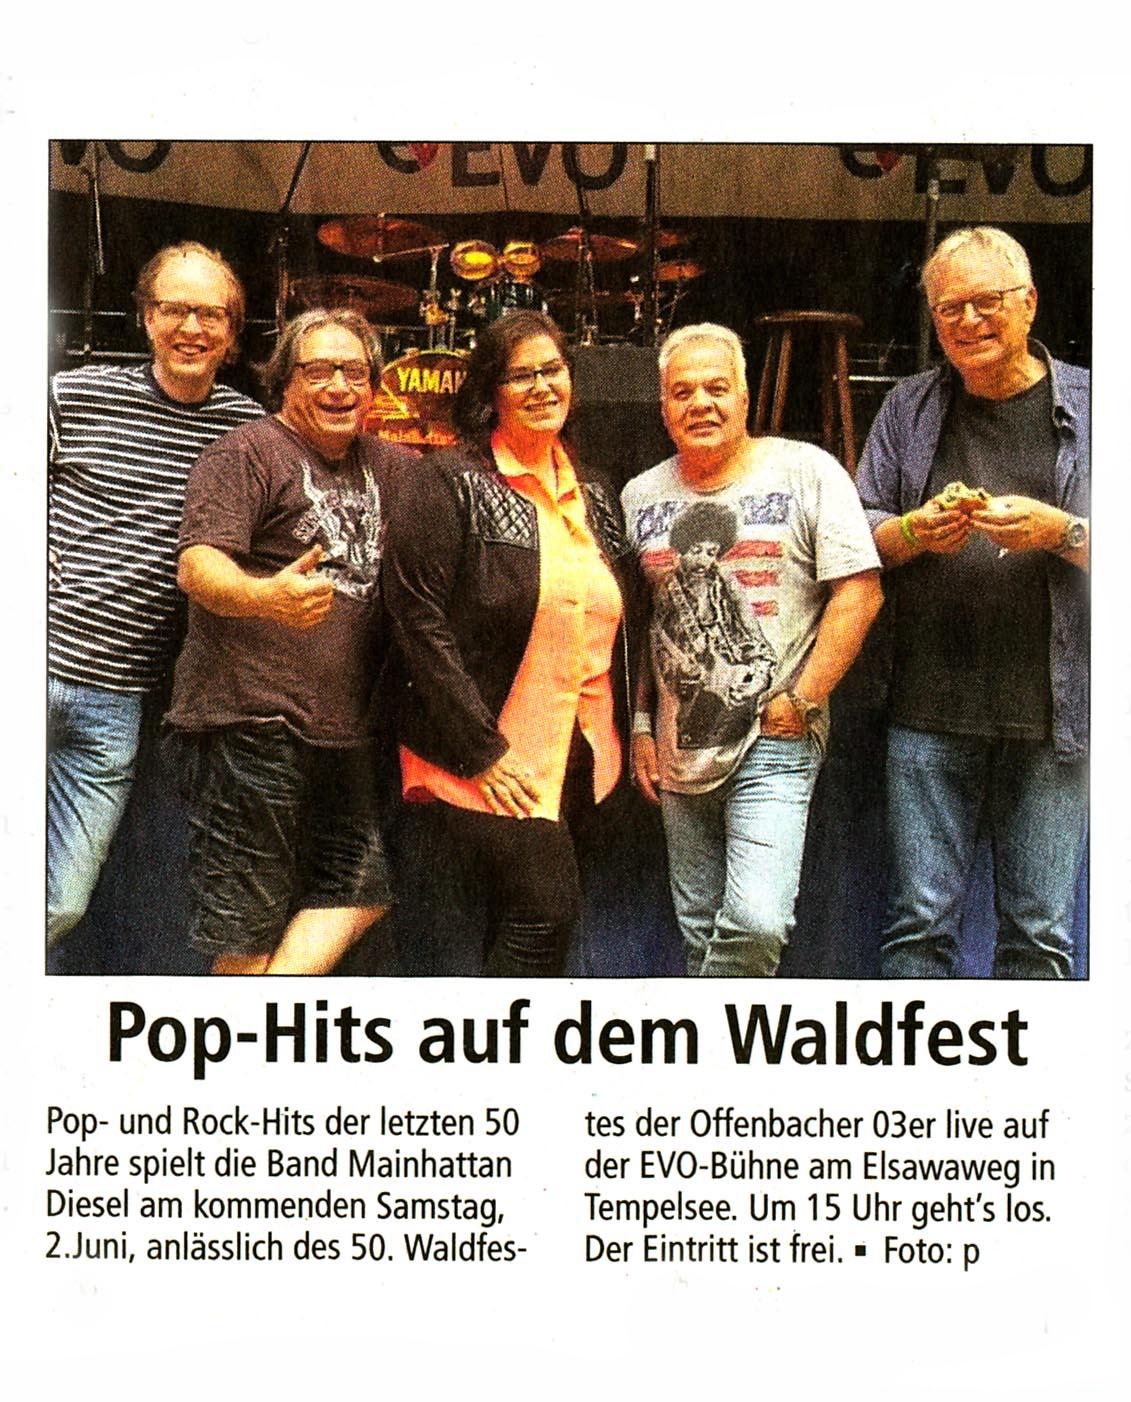 Offenbach Post, 30. Mai 2018